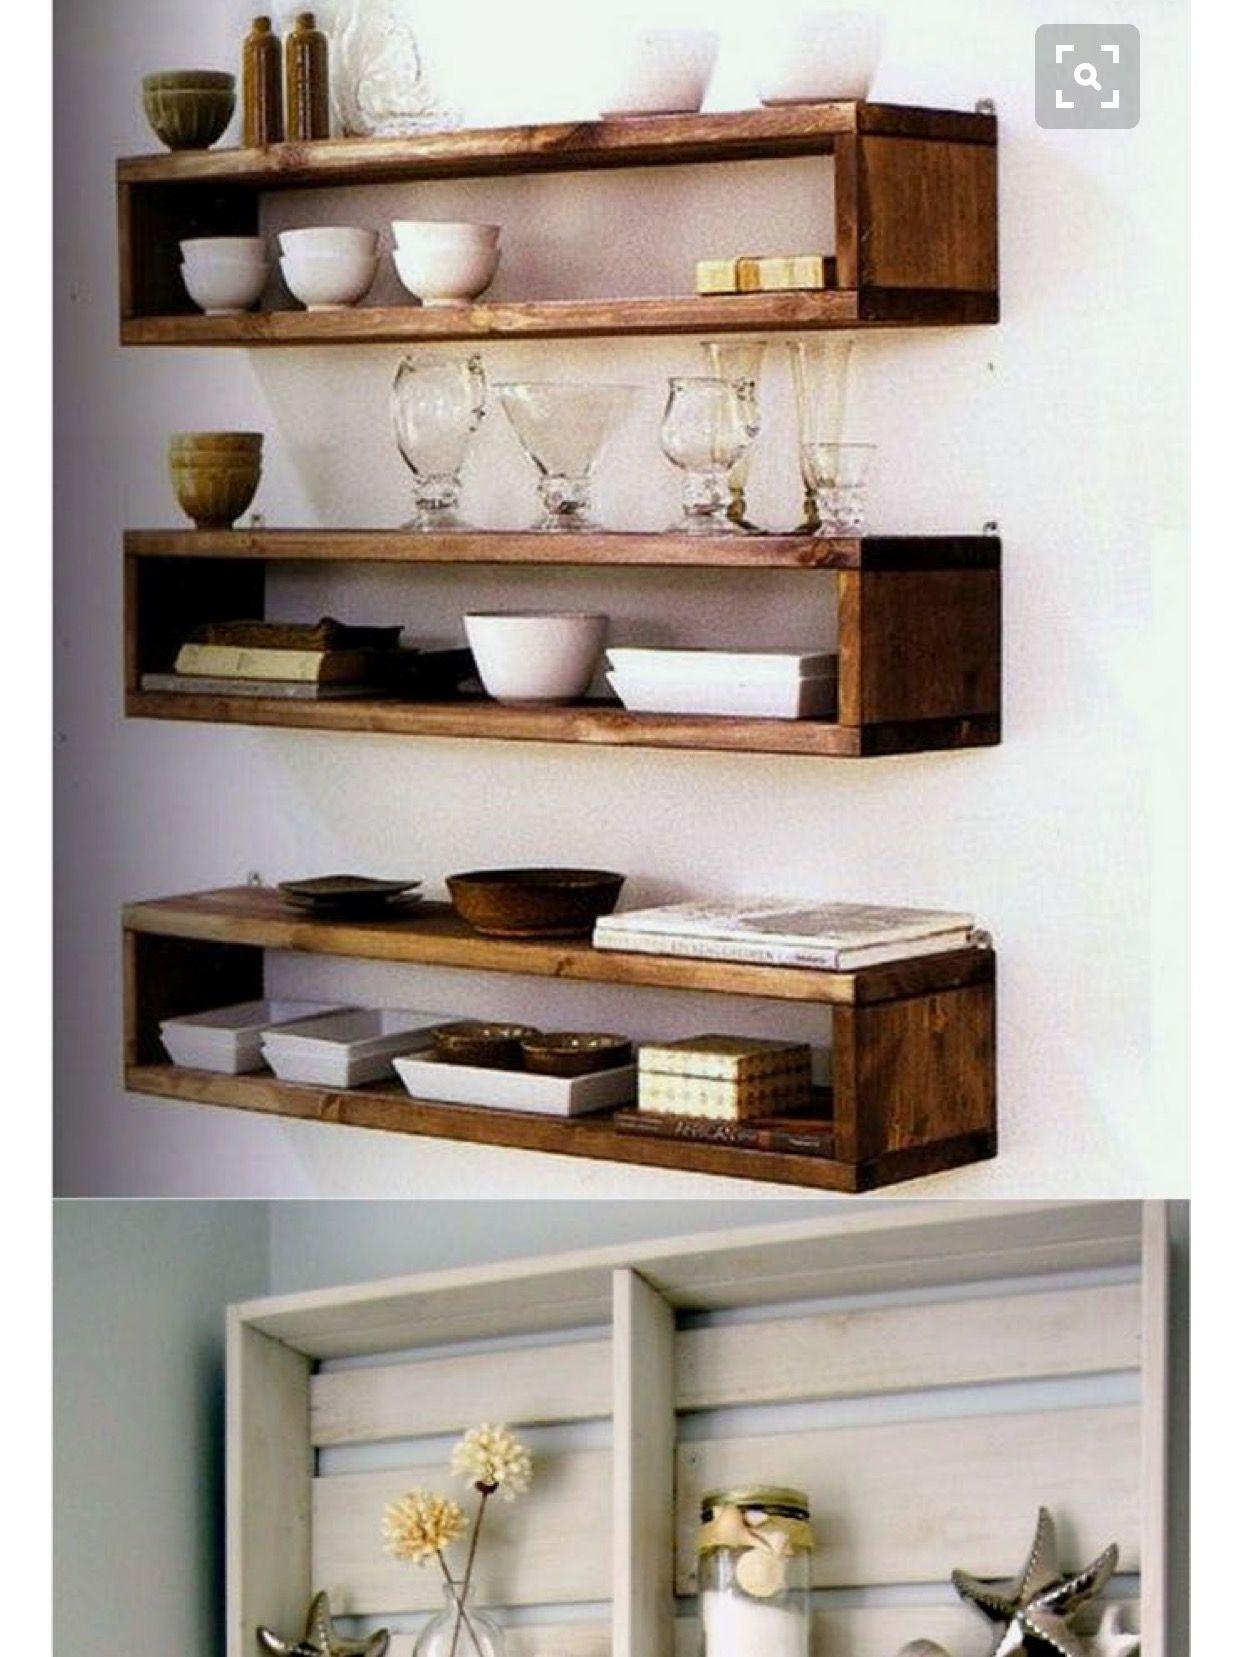 Pin by Stephanie Christine on D I Y | Wood box shelves, Easy ...